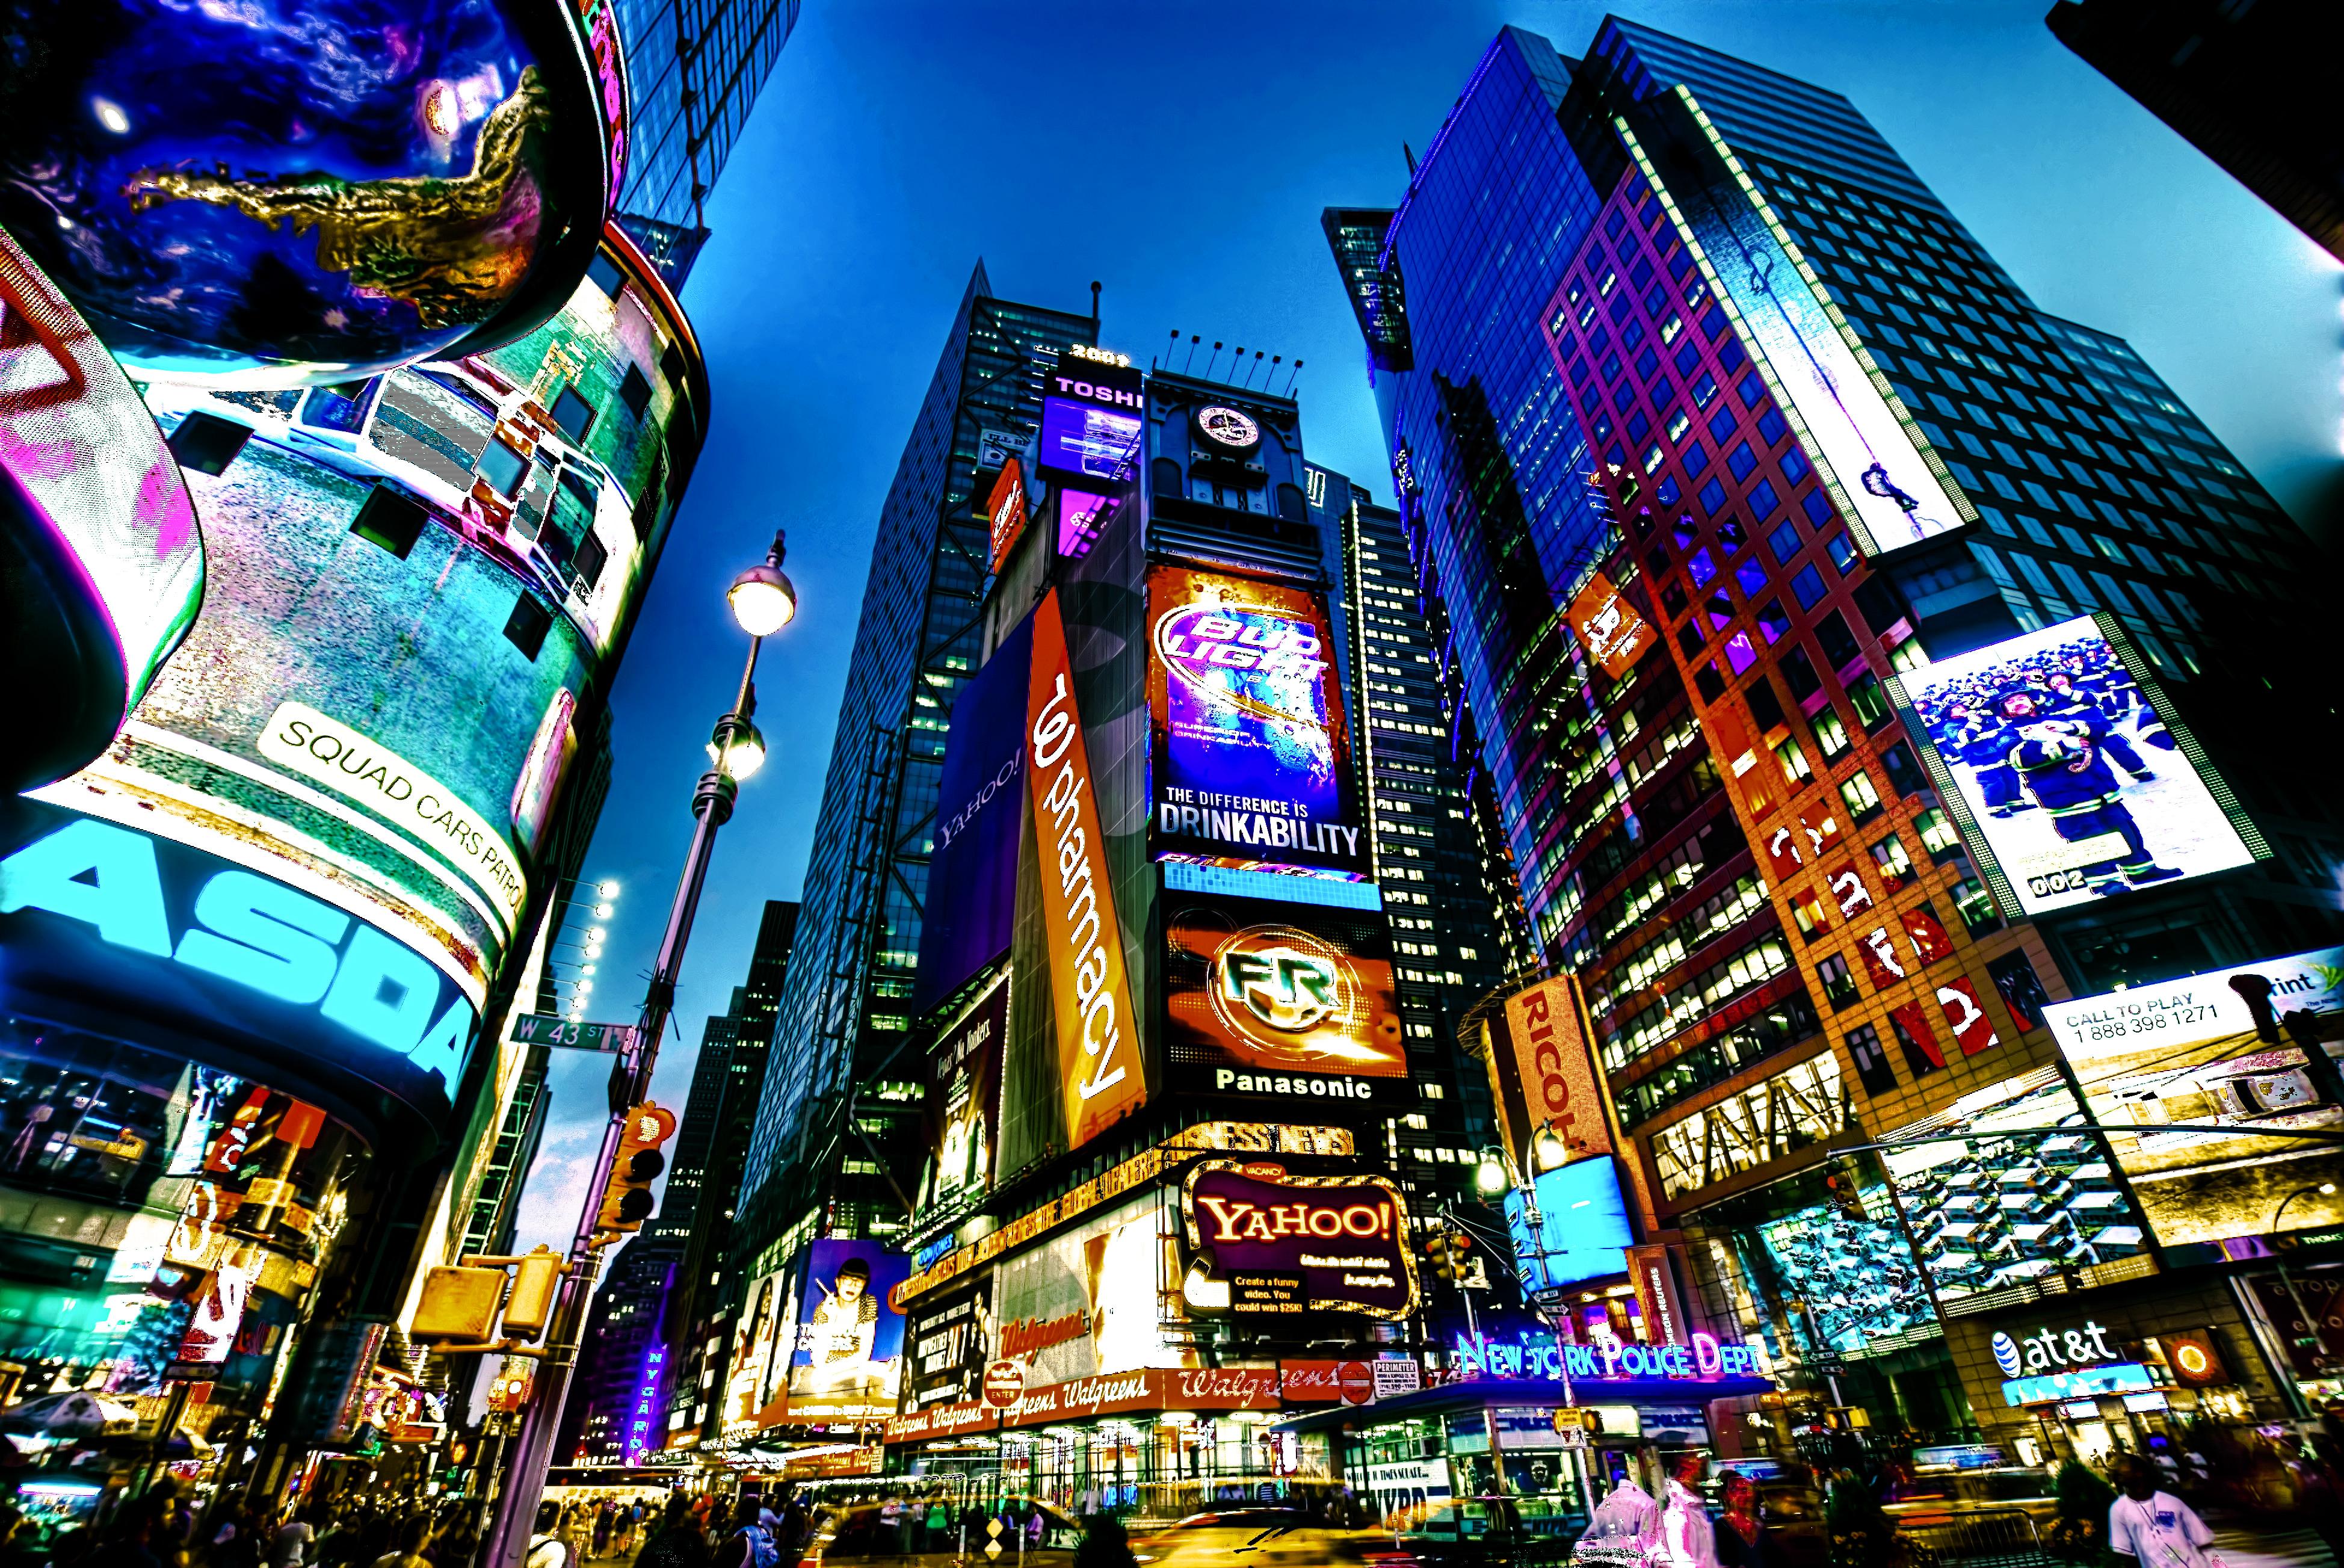 Usa New York Wallpaper Times Square New York Usa City